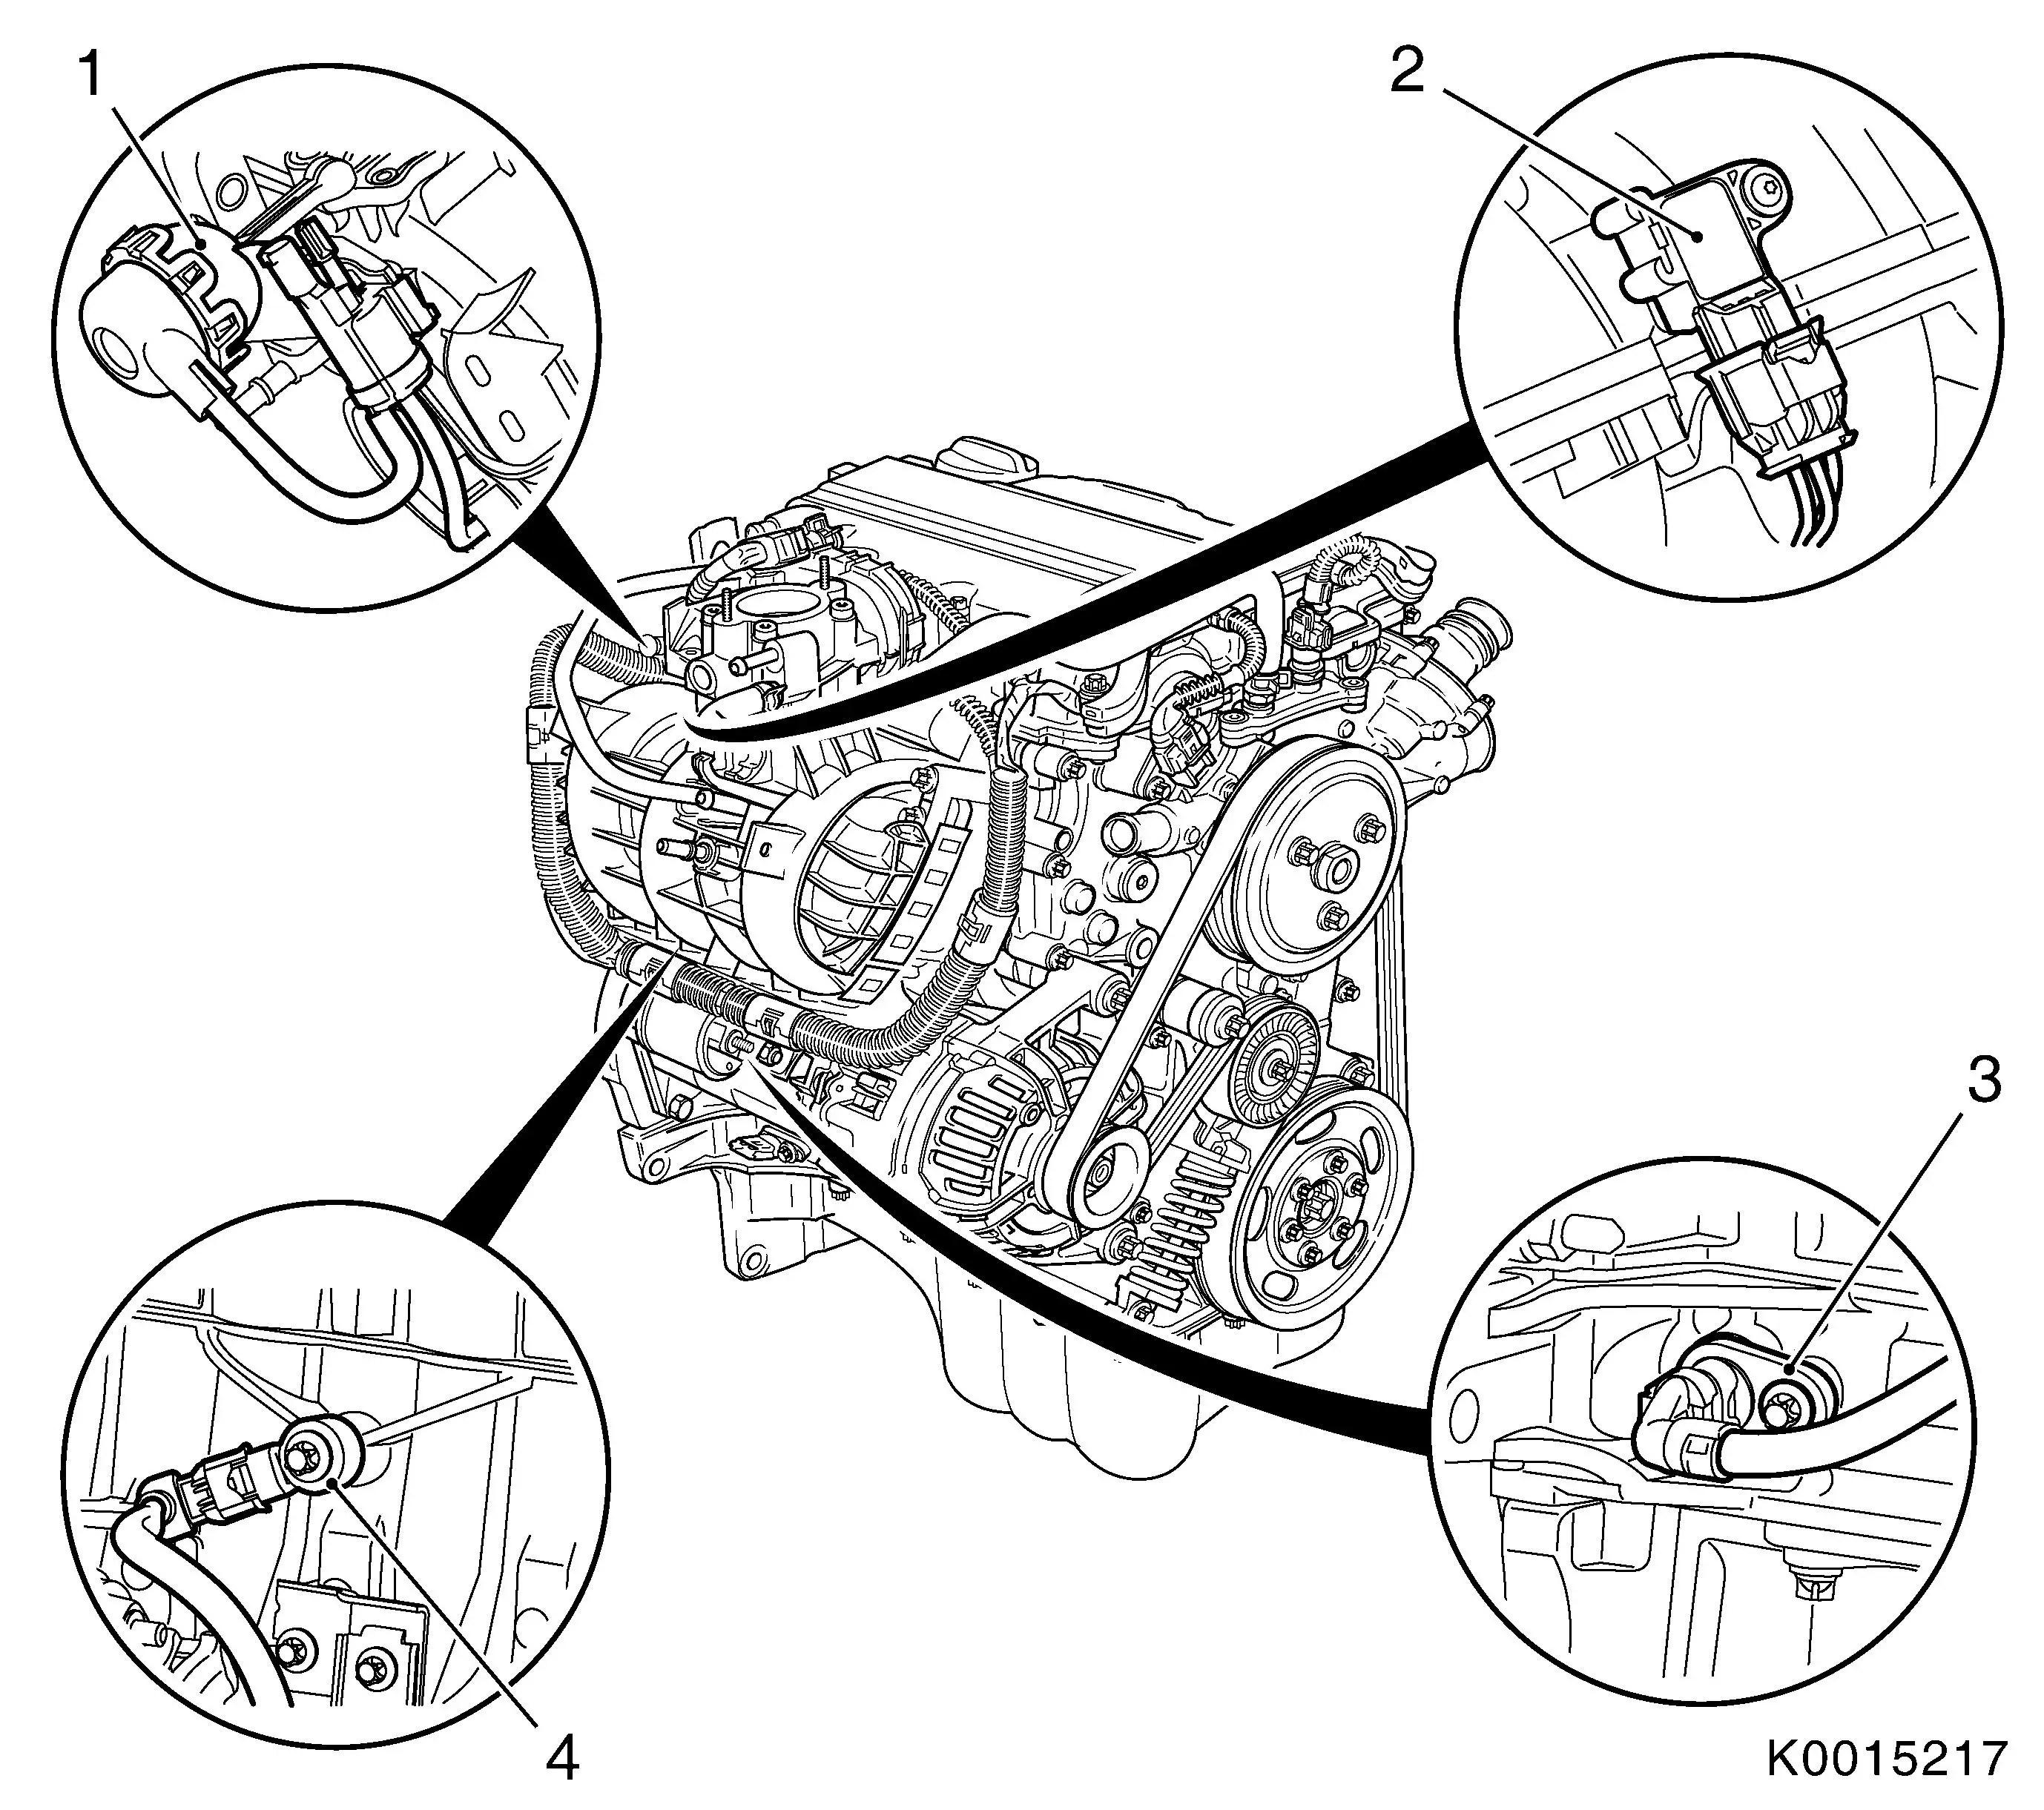 1993 pontiac grand am wiring diagram wiring diagrams regarding in 2001 pontiac grand am parts diagram